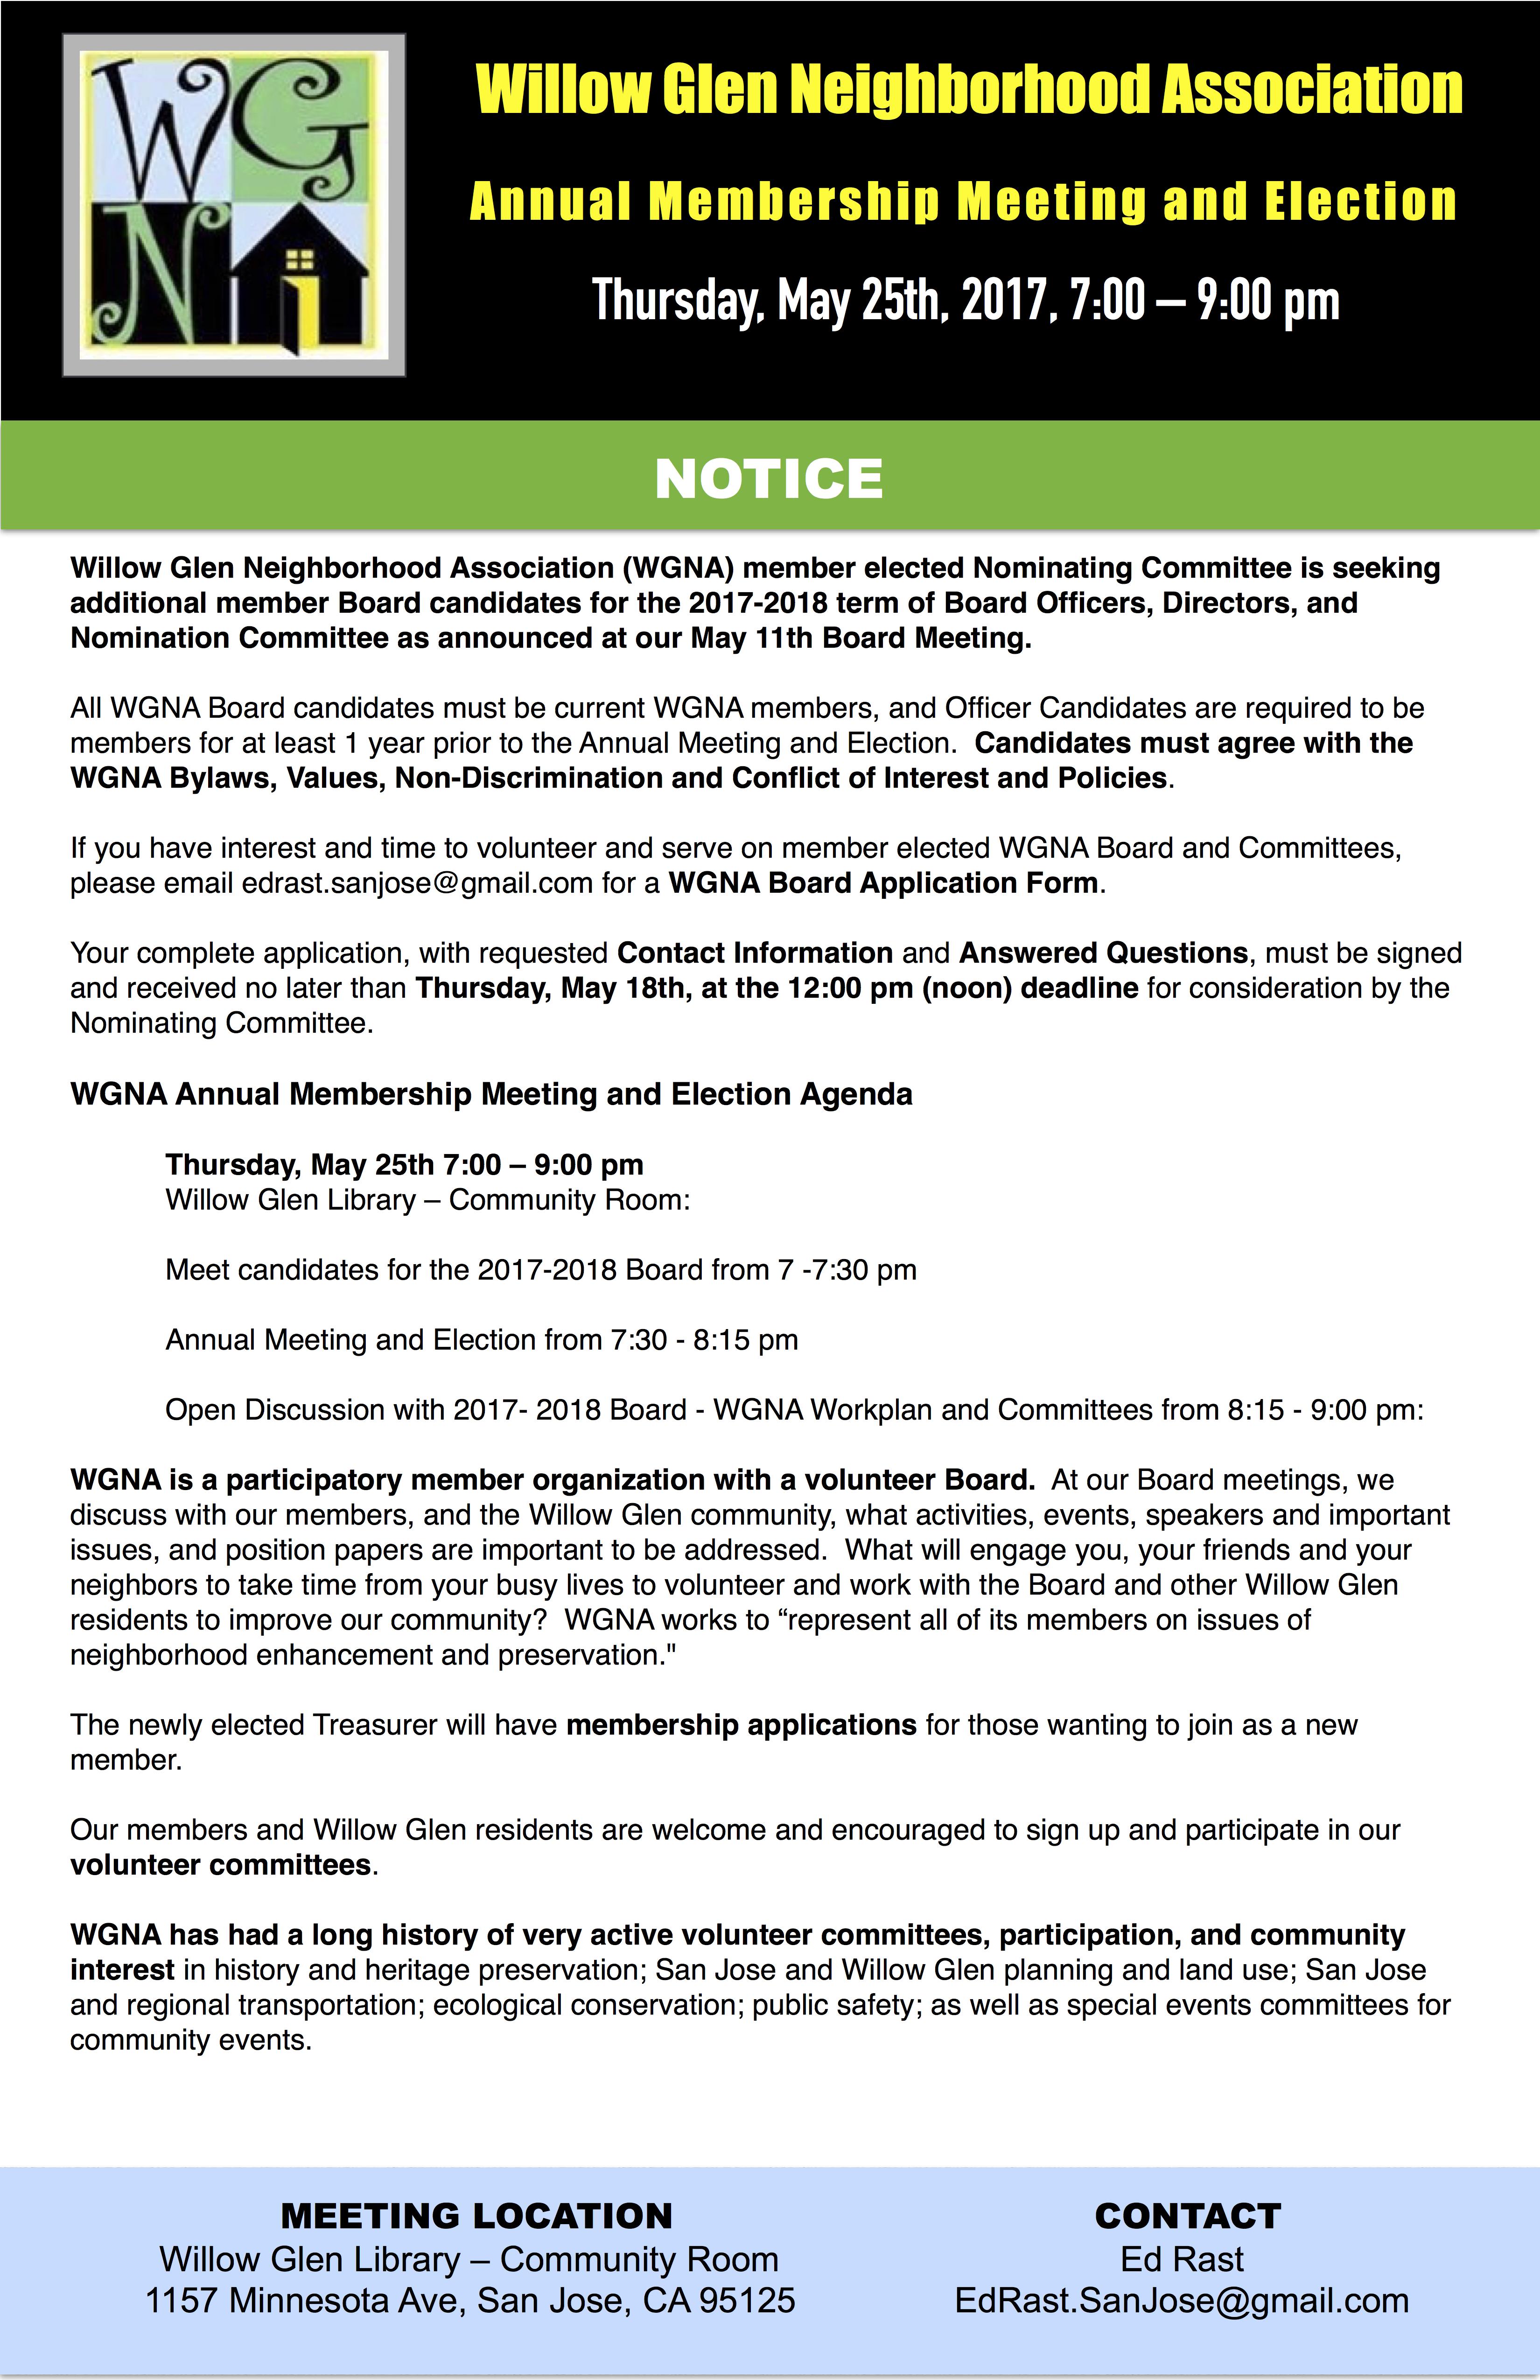 WGNA_25_May_2017_Annual_Meeting_2017.jpg